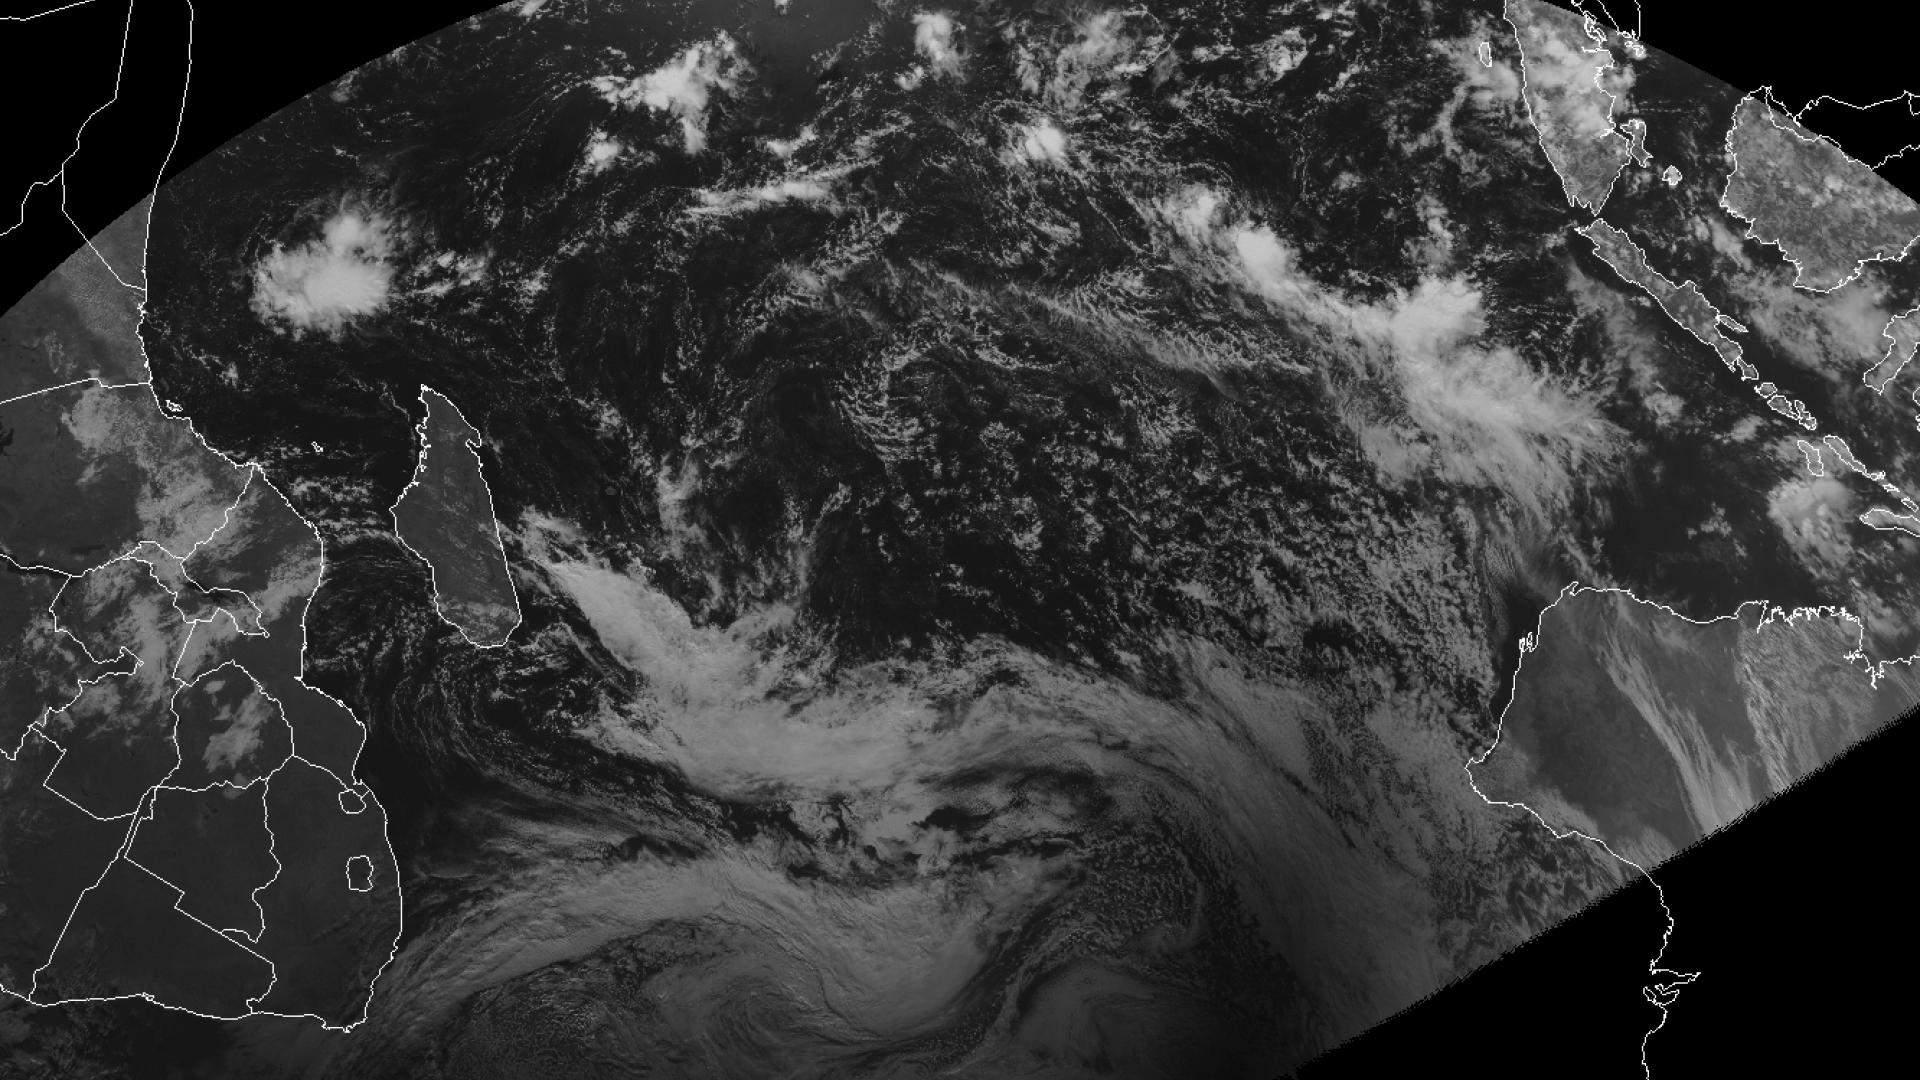 Annular solar eclipse over Antarctica